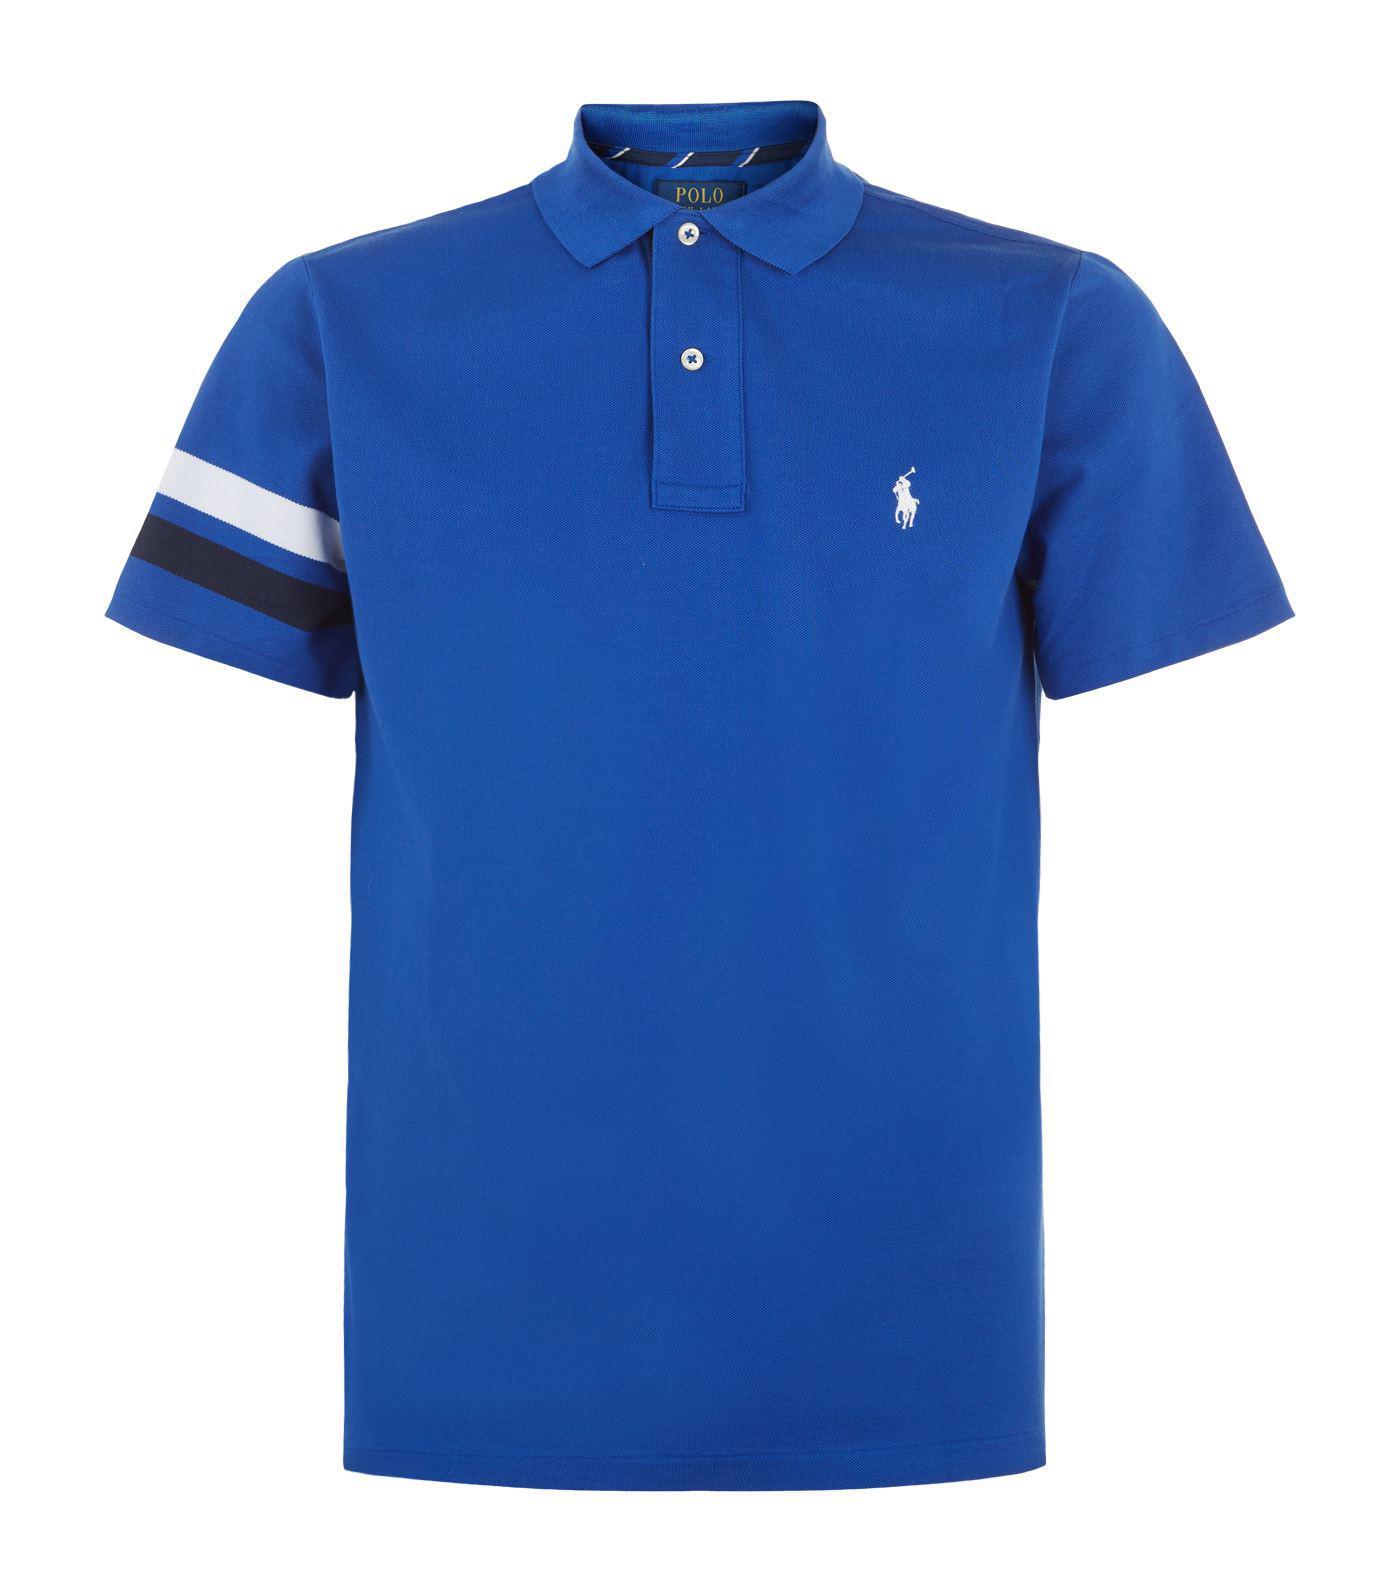 64274f4075 Polo Ralph Lauren Blue Wimbledon Slim Fit Polo Shirt for men